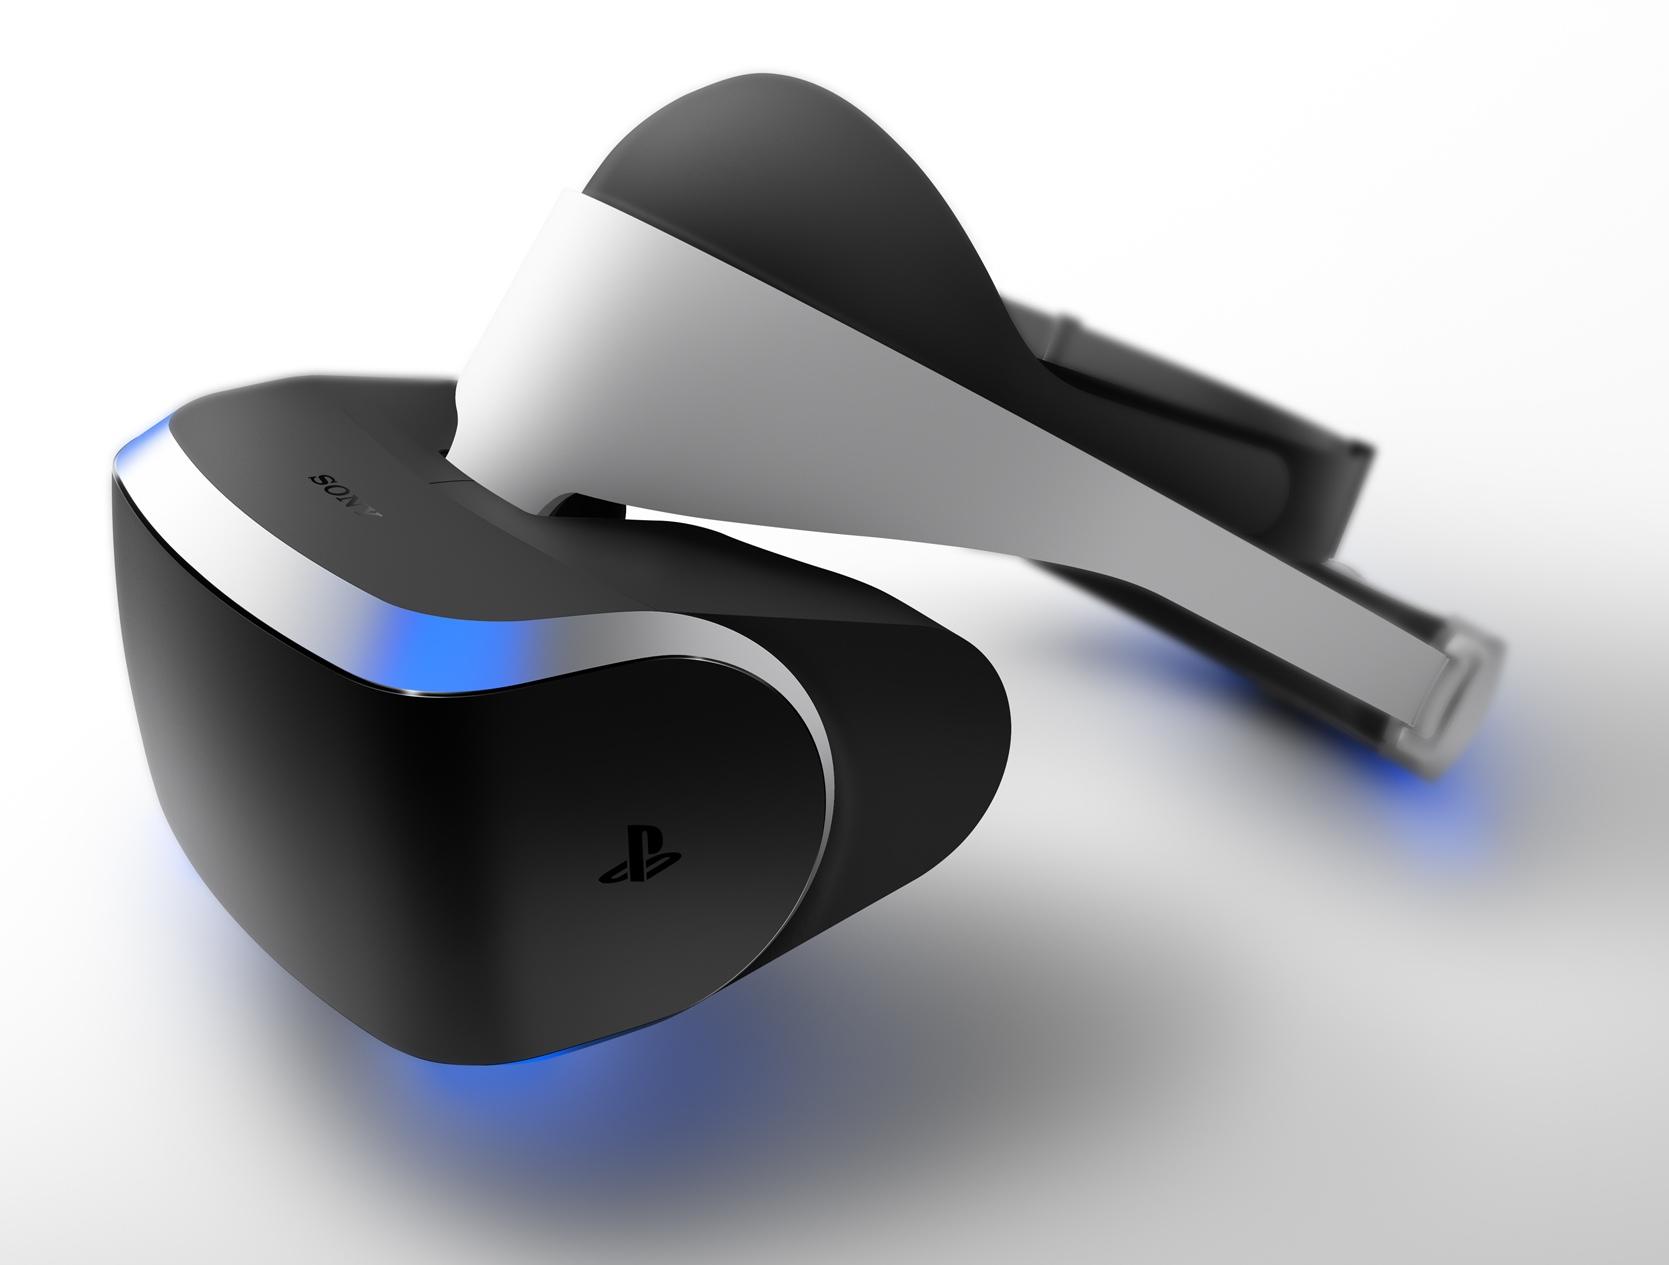 Sony Project Morpheus (image 001)